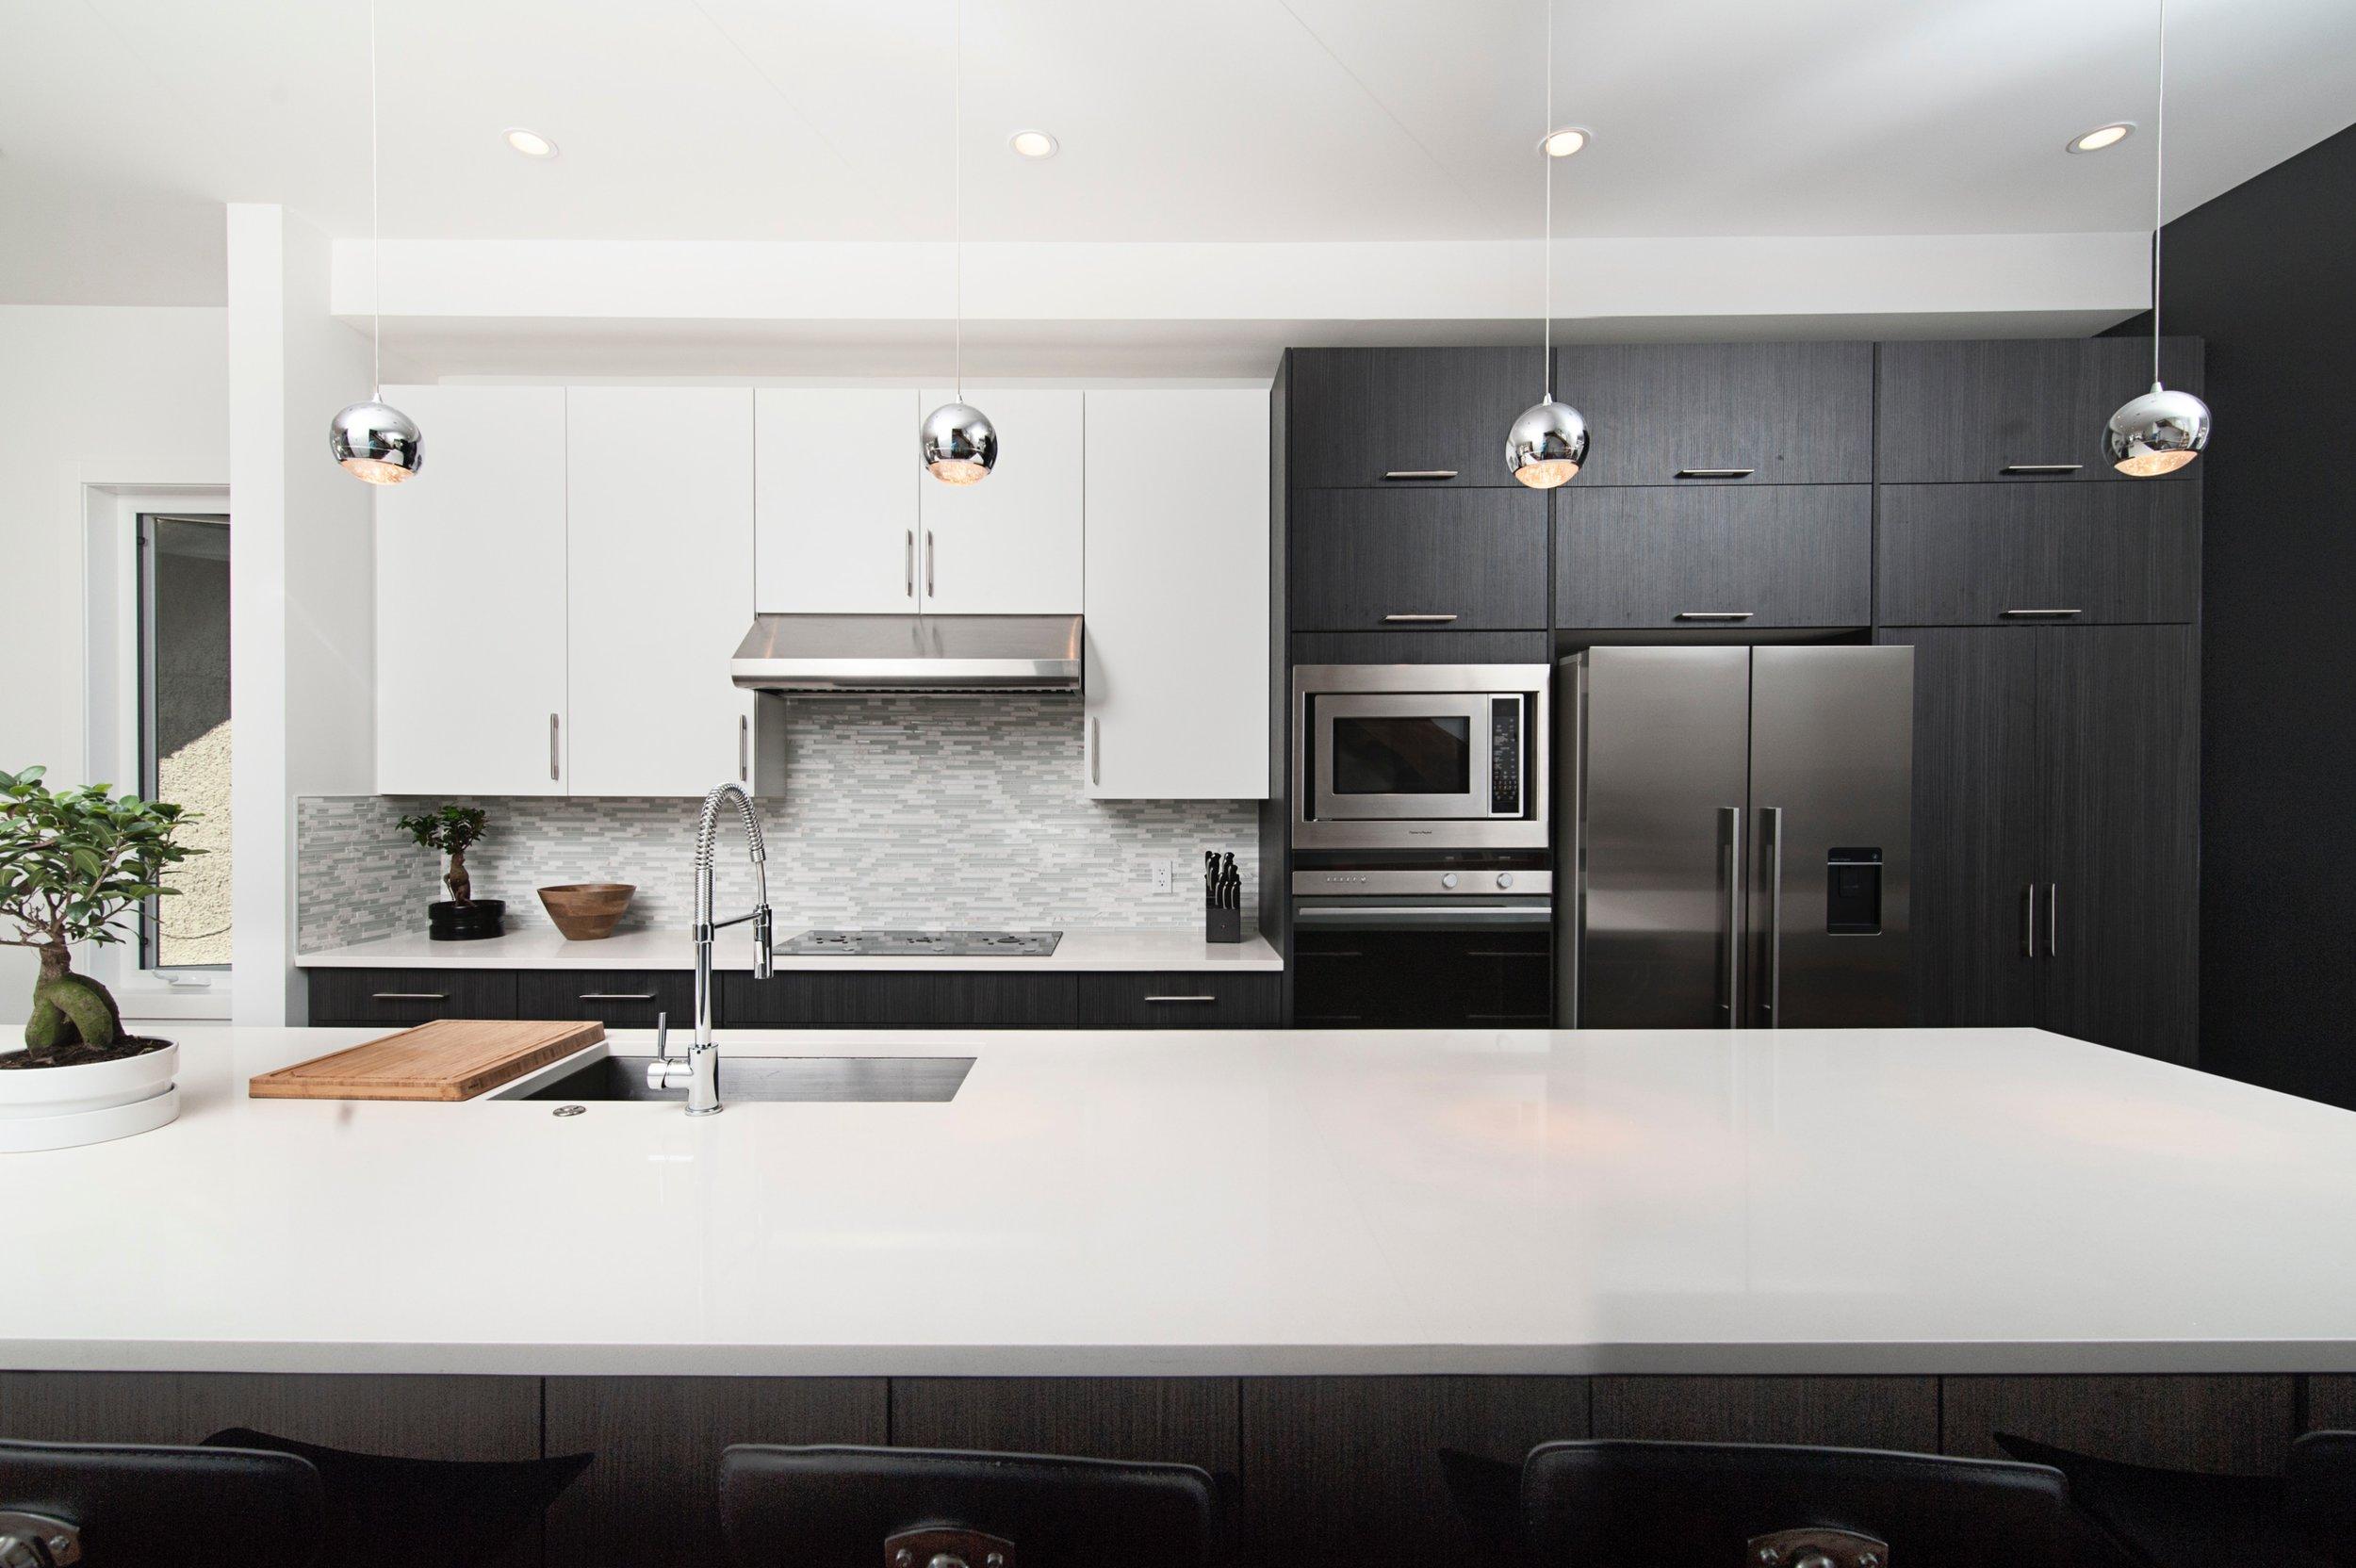 BIZ-LOCATION-real-life-interior-design-compared-to-reality-tv-kitchen-renovation.jpg